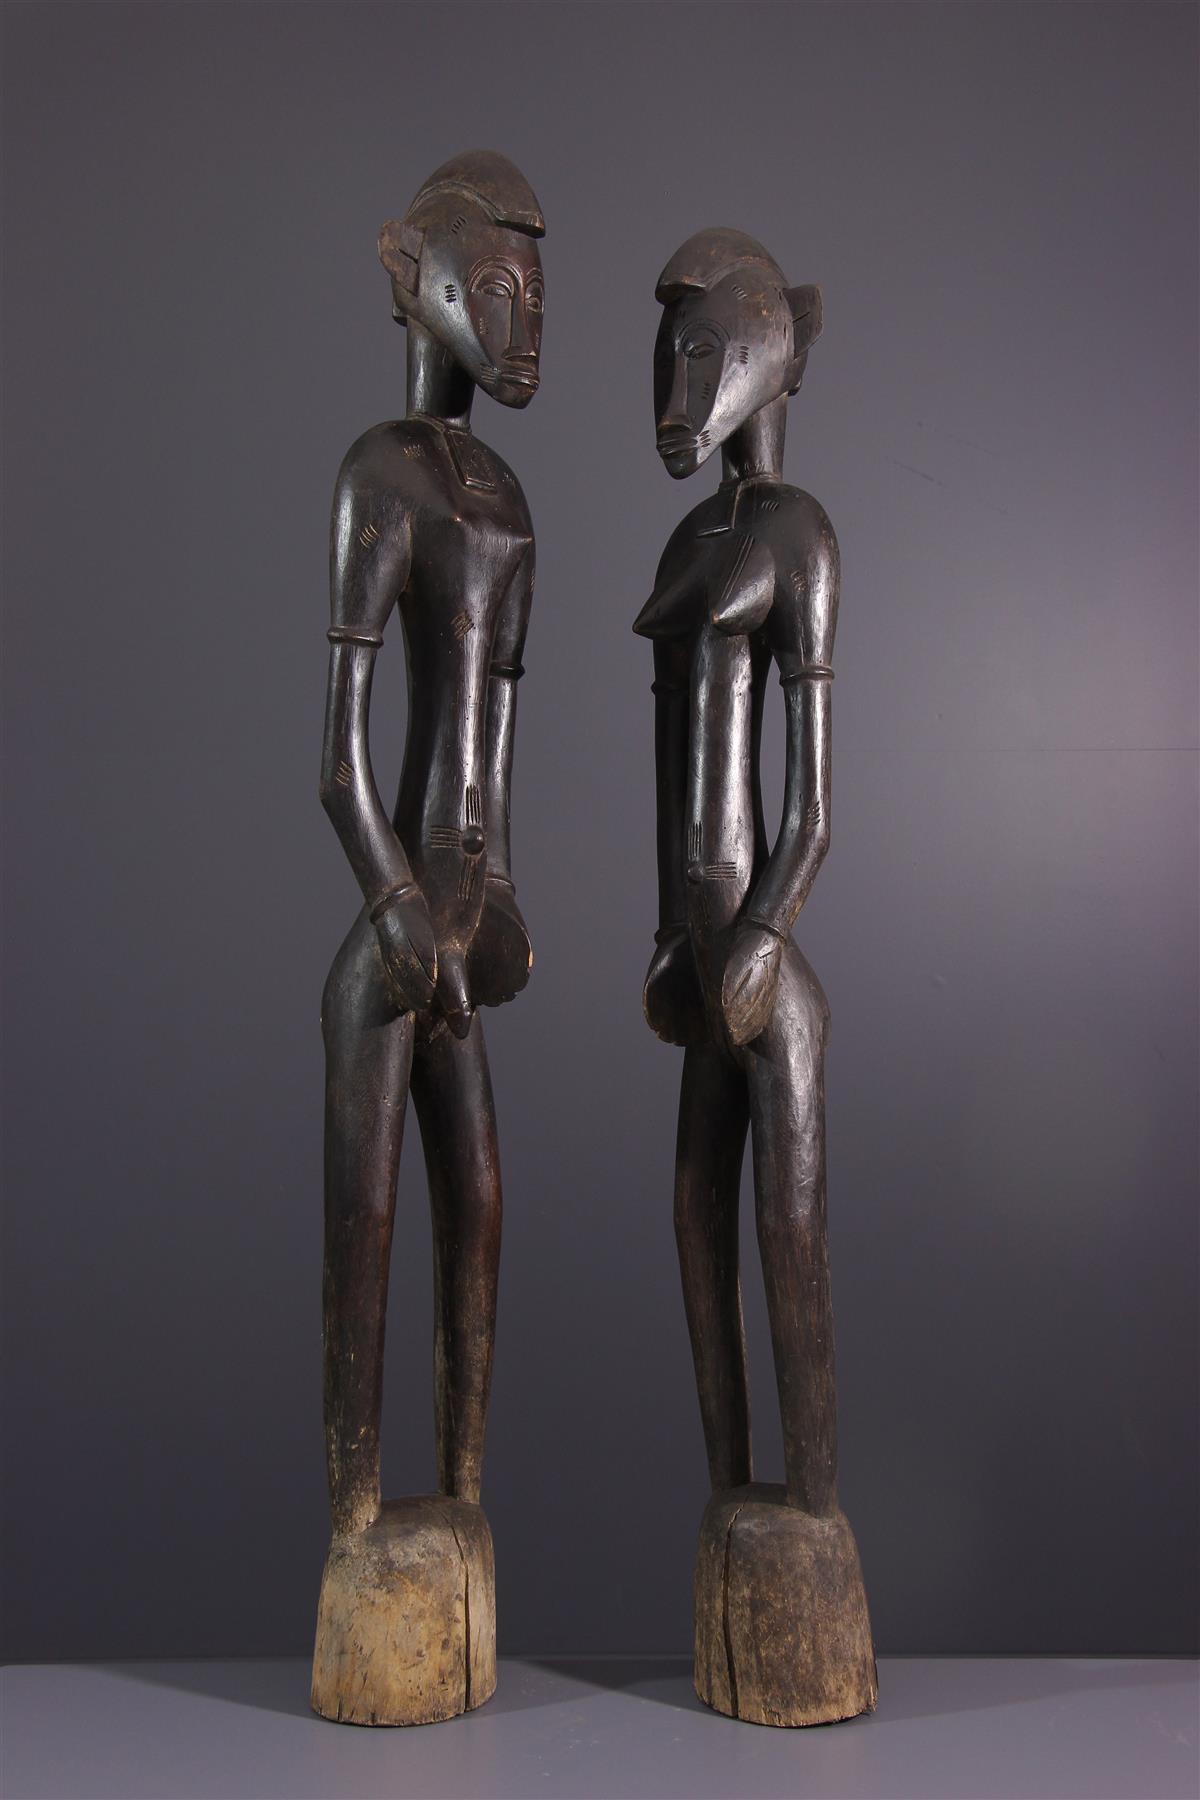 Statues Debele - African art